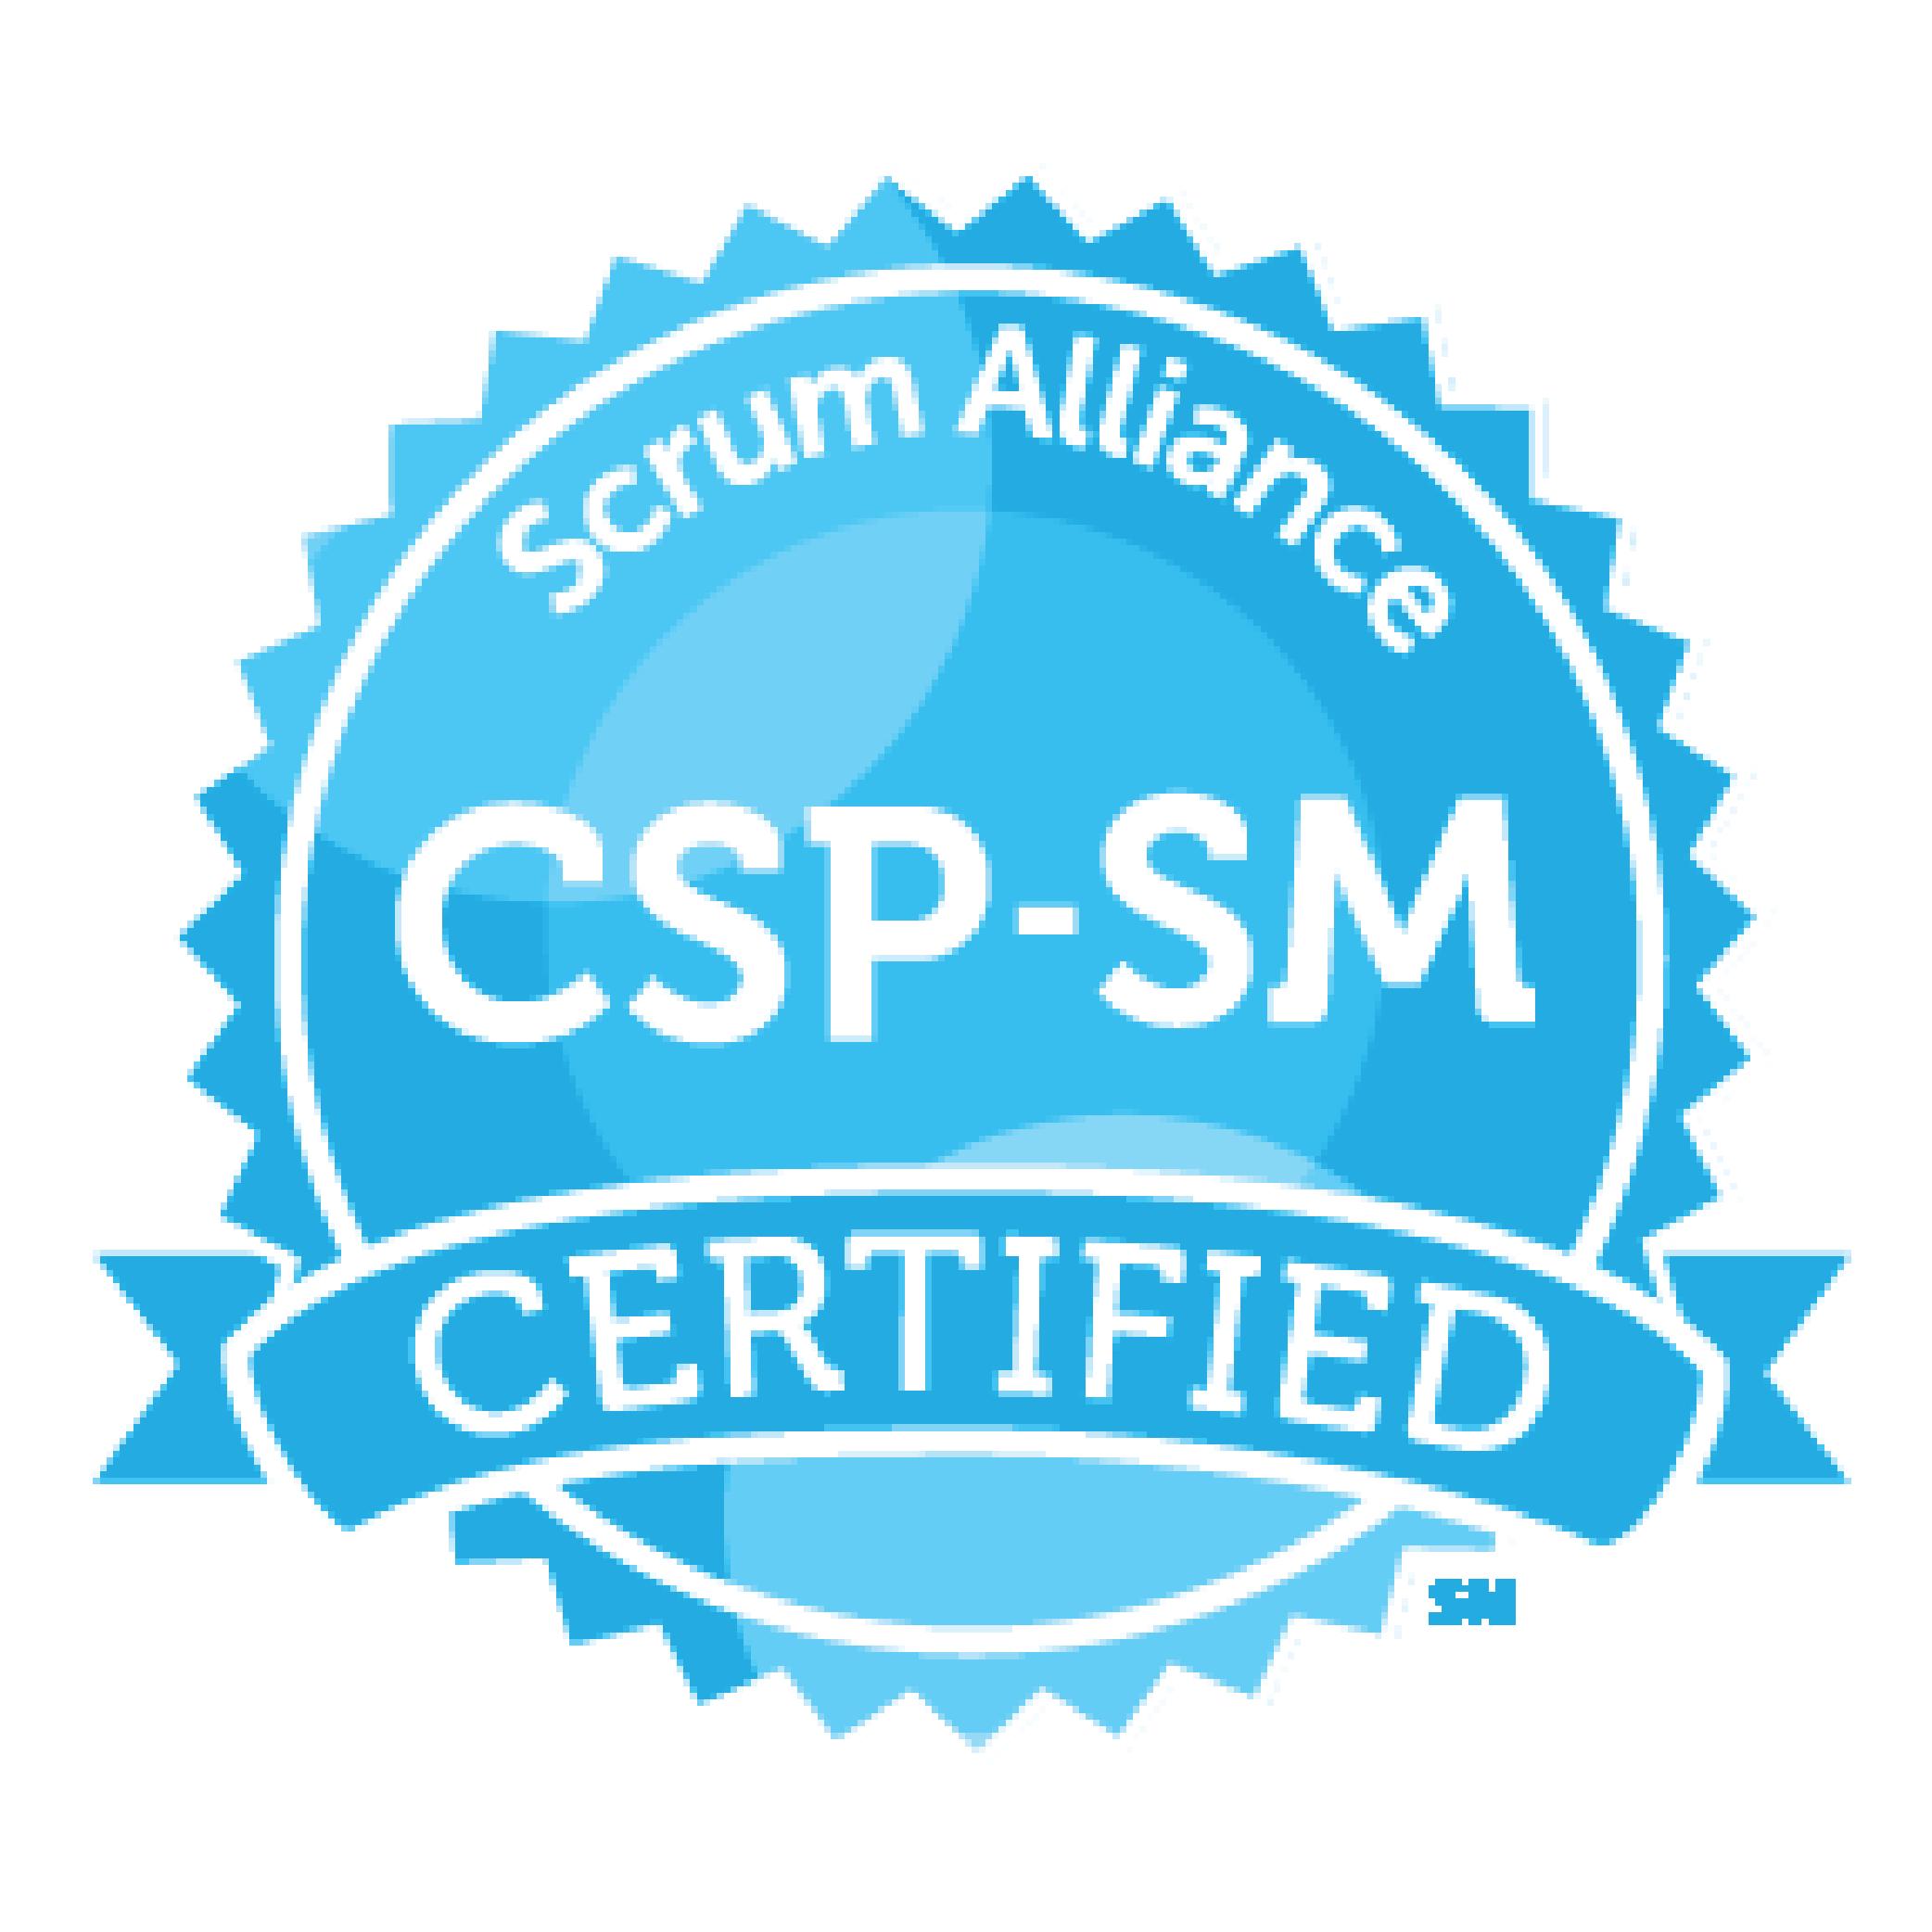 CSP-SM-01.png